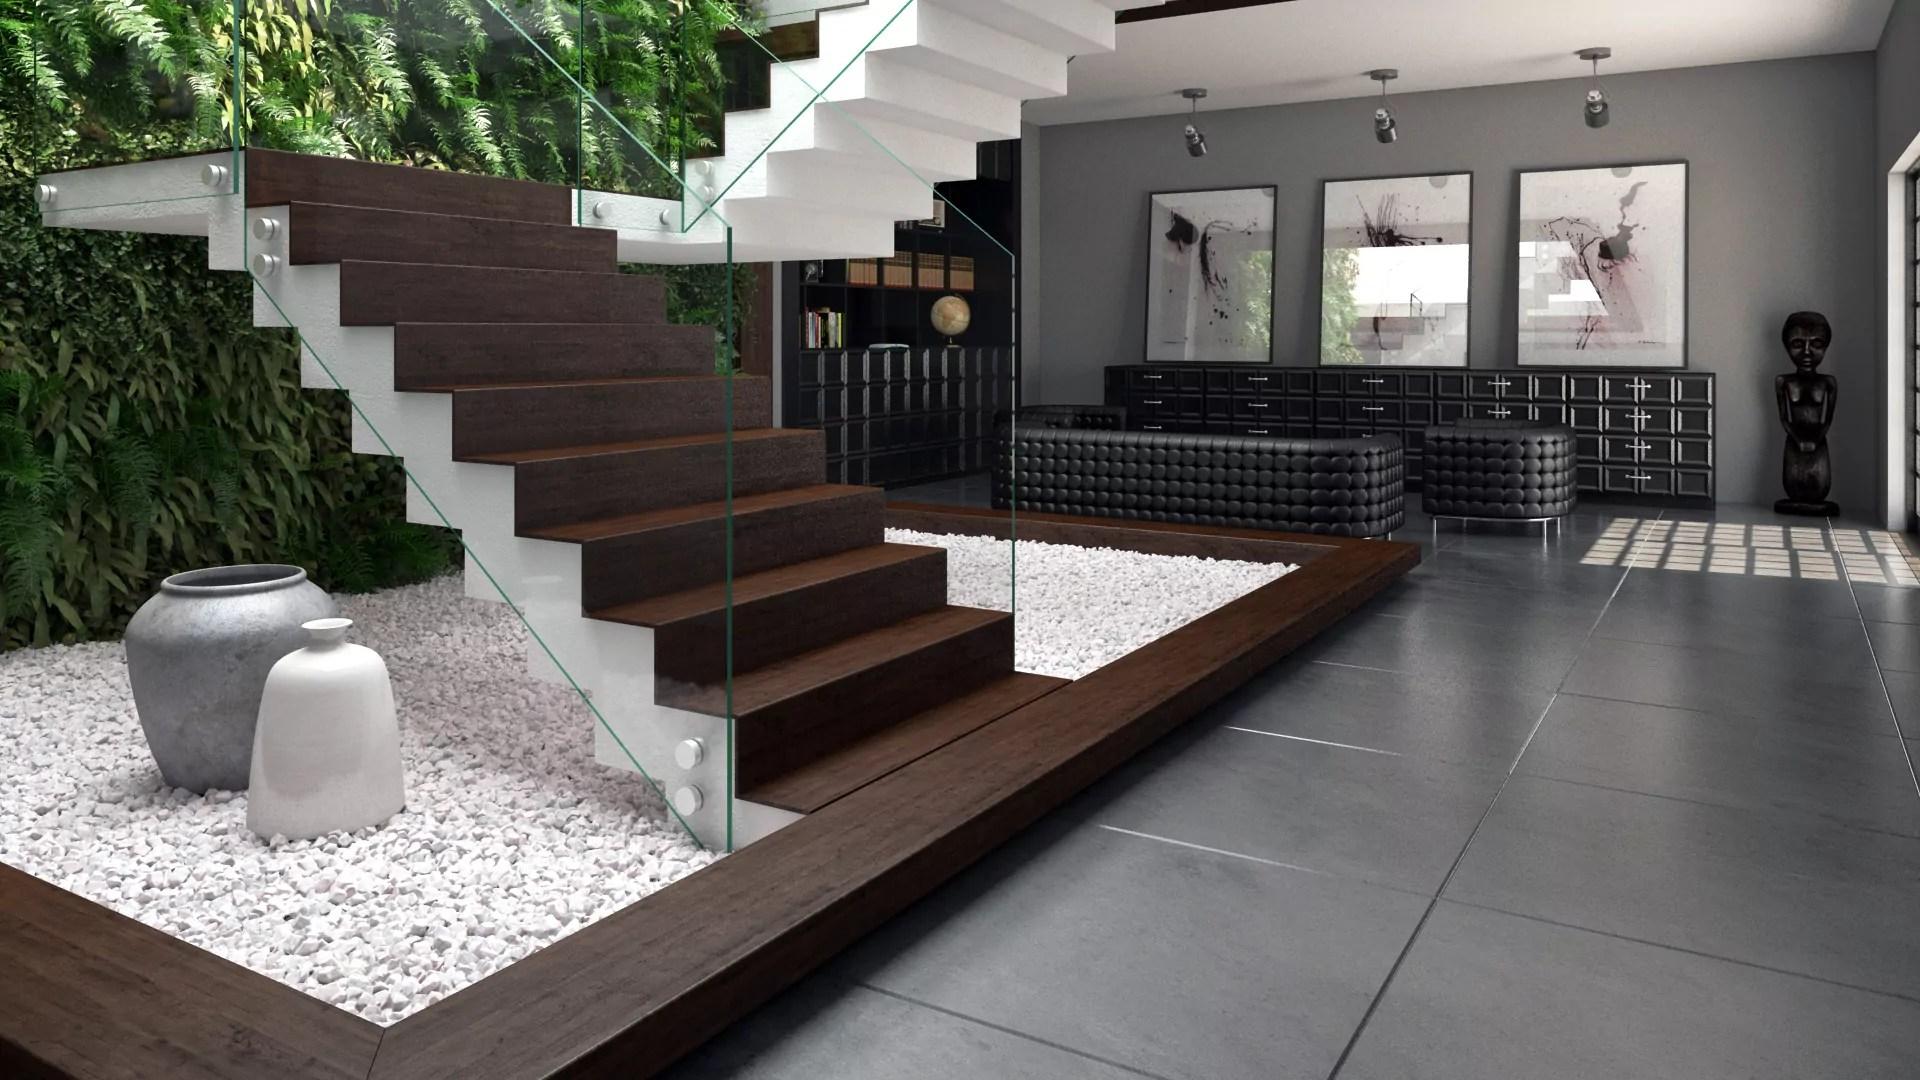 design de interiores no condomnio lago azul 8 HAUS